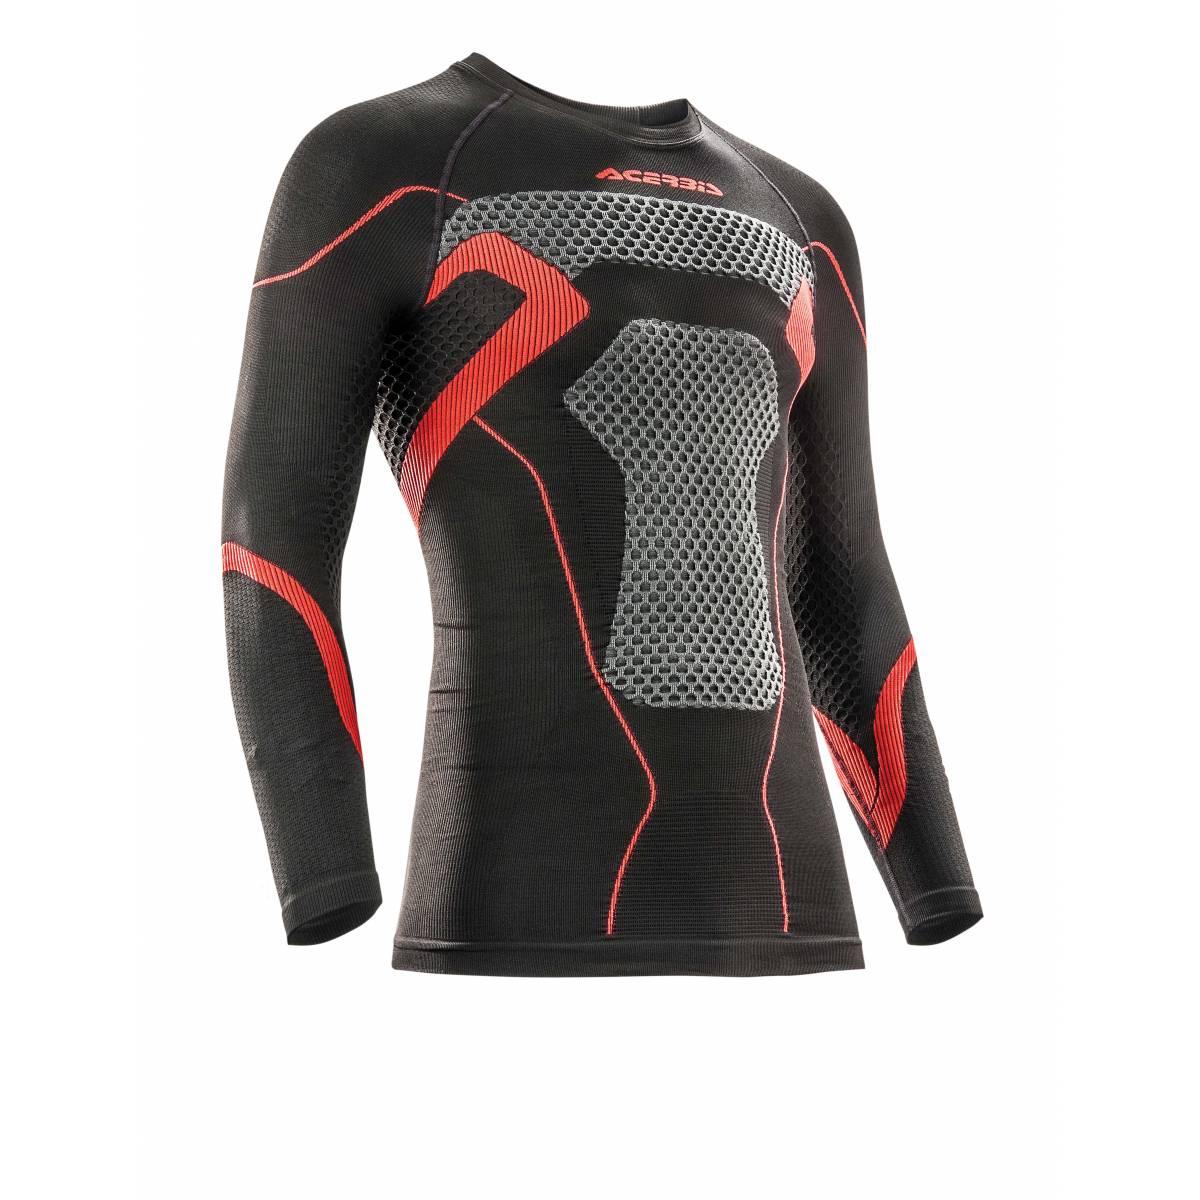 0021912-323 - Camiseta X-Body Winter Acerbis Negro Rojo